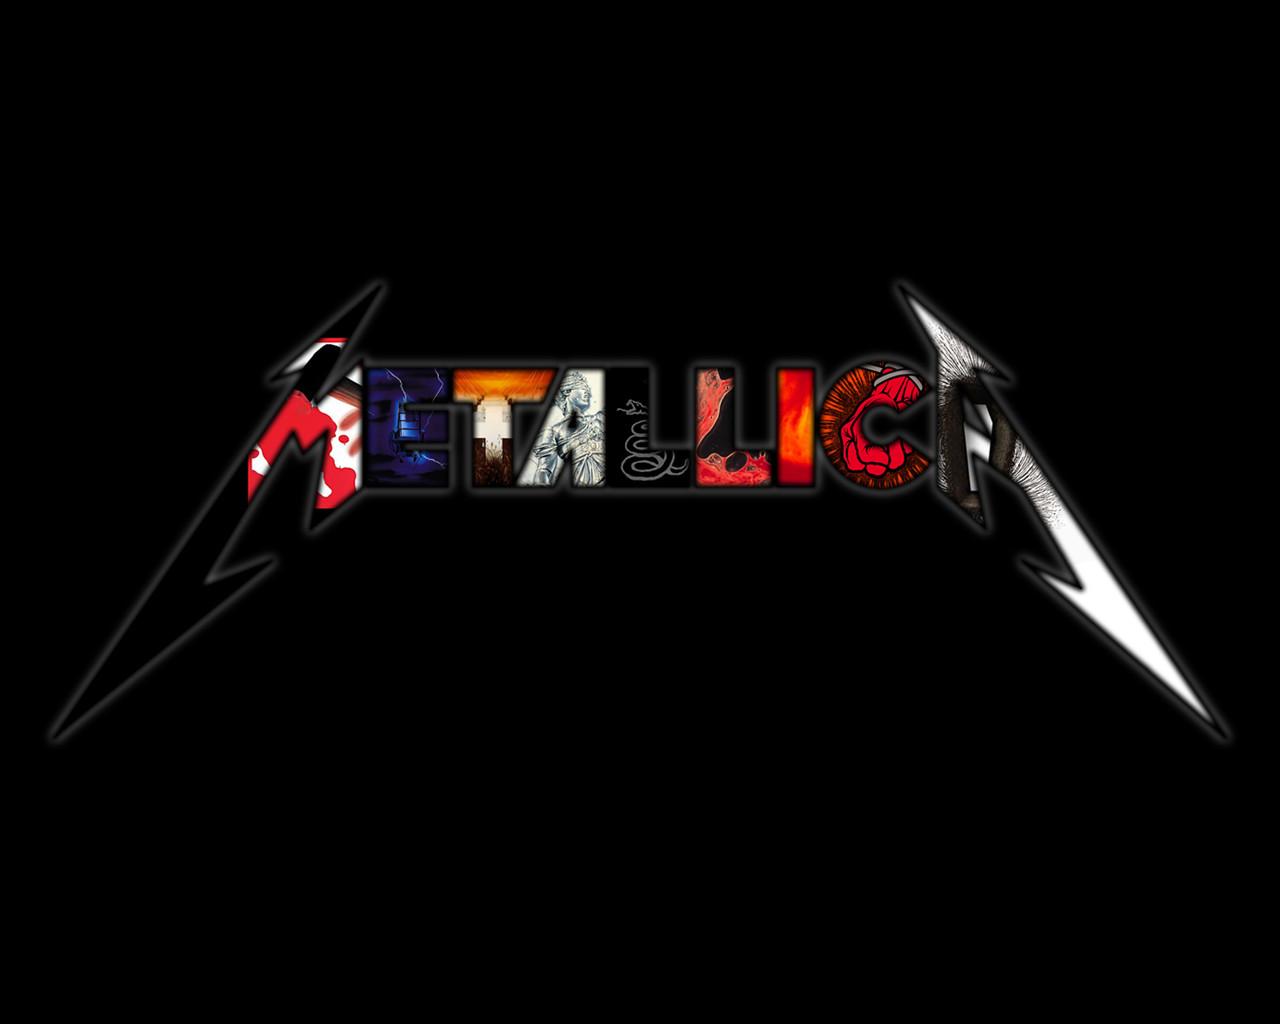 Metallica Logo Wallpaper 57110 IMGFLASH 1280x1024